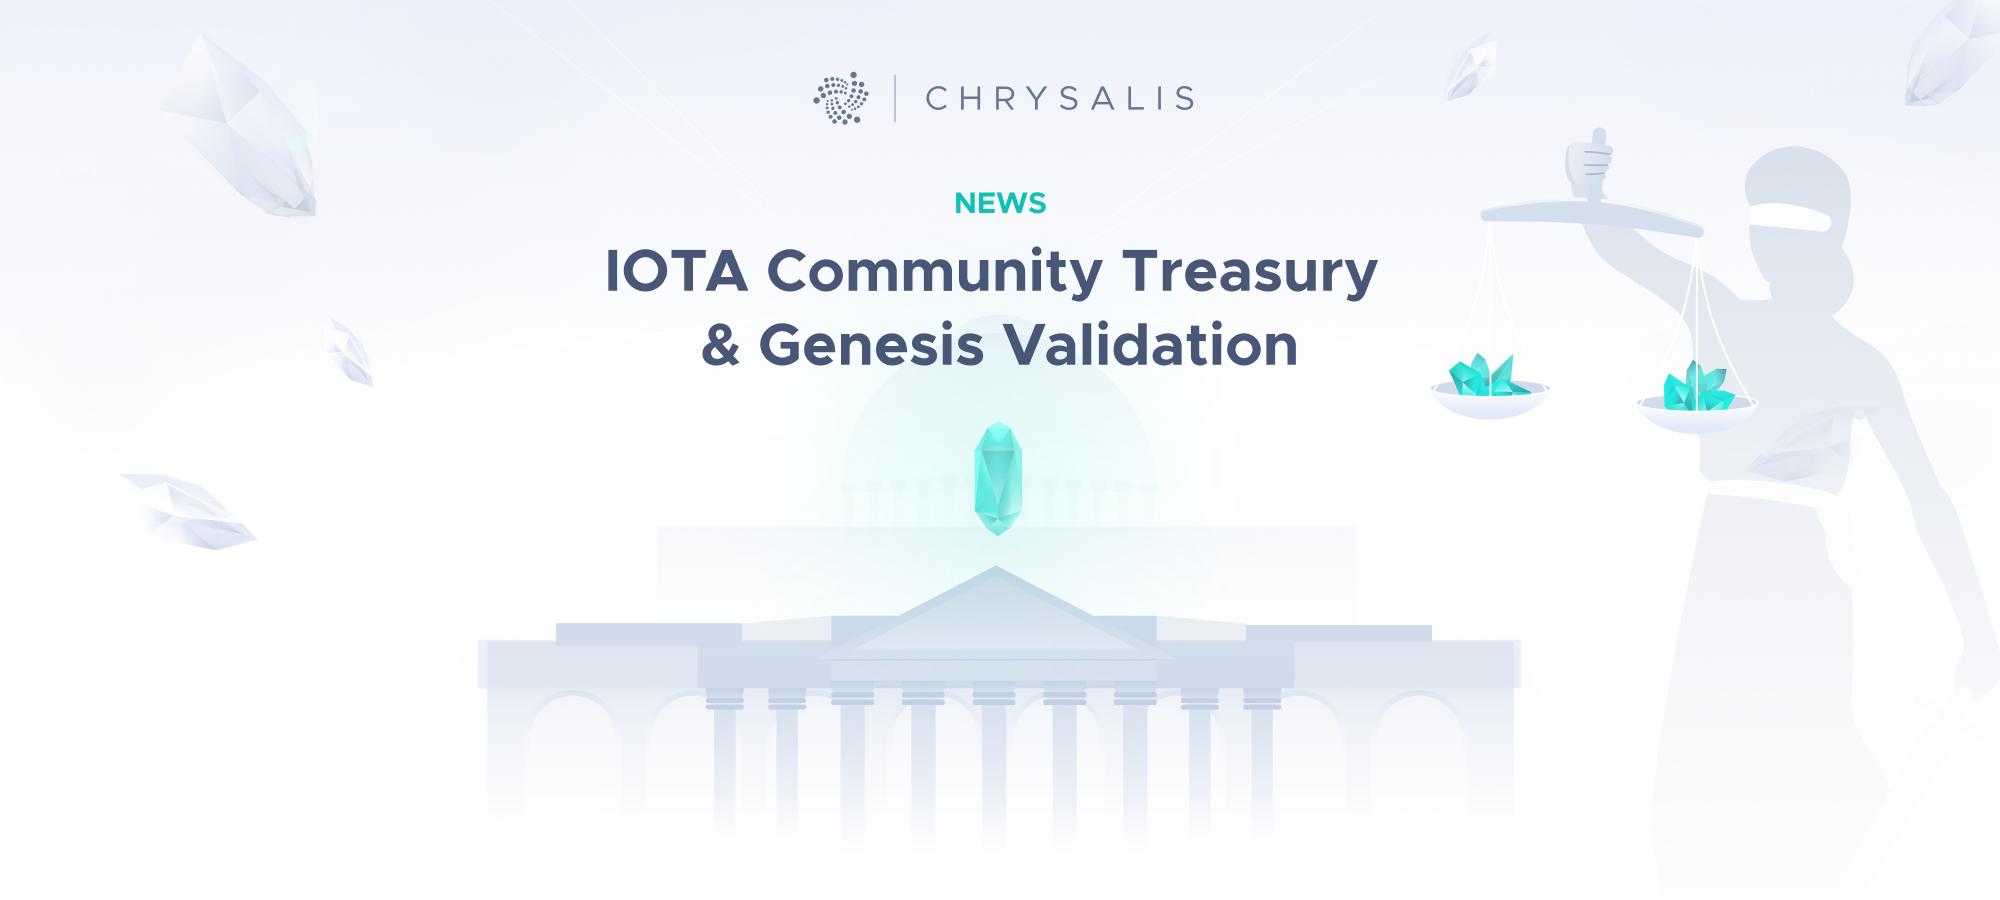 IOTA Community Treasury and Genesis Validation